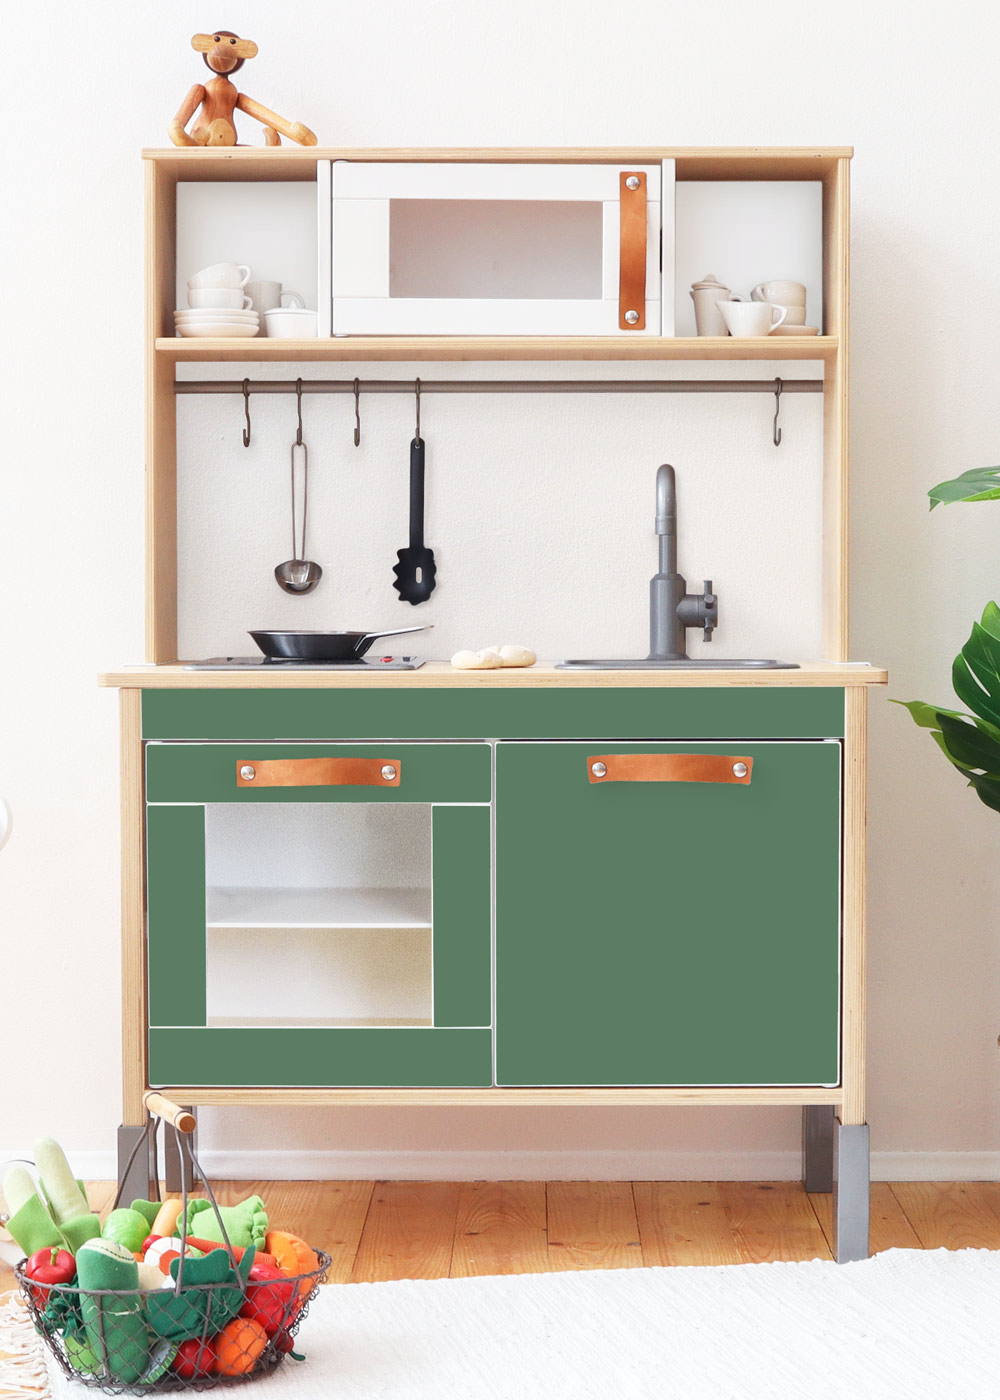 Ikea Duktig Kinderküche Frontli Immergrün Frontansicht